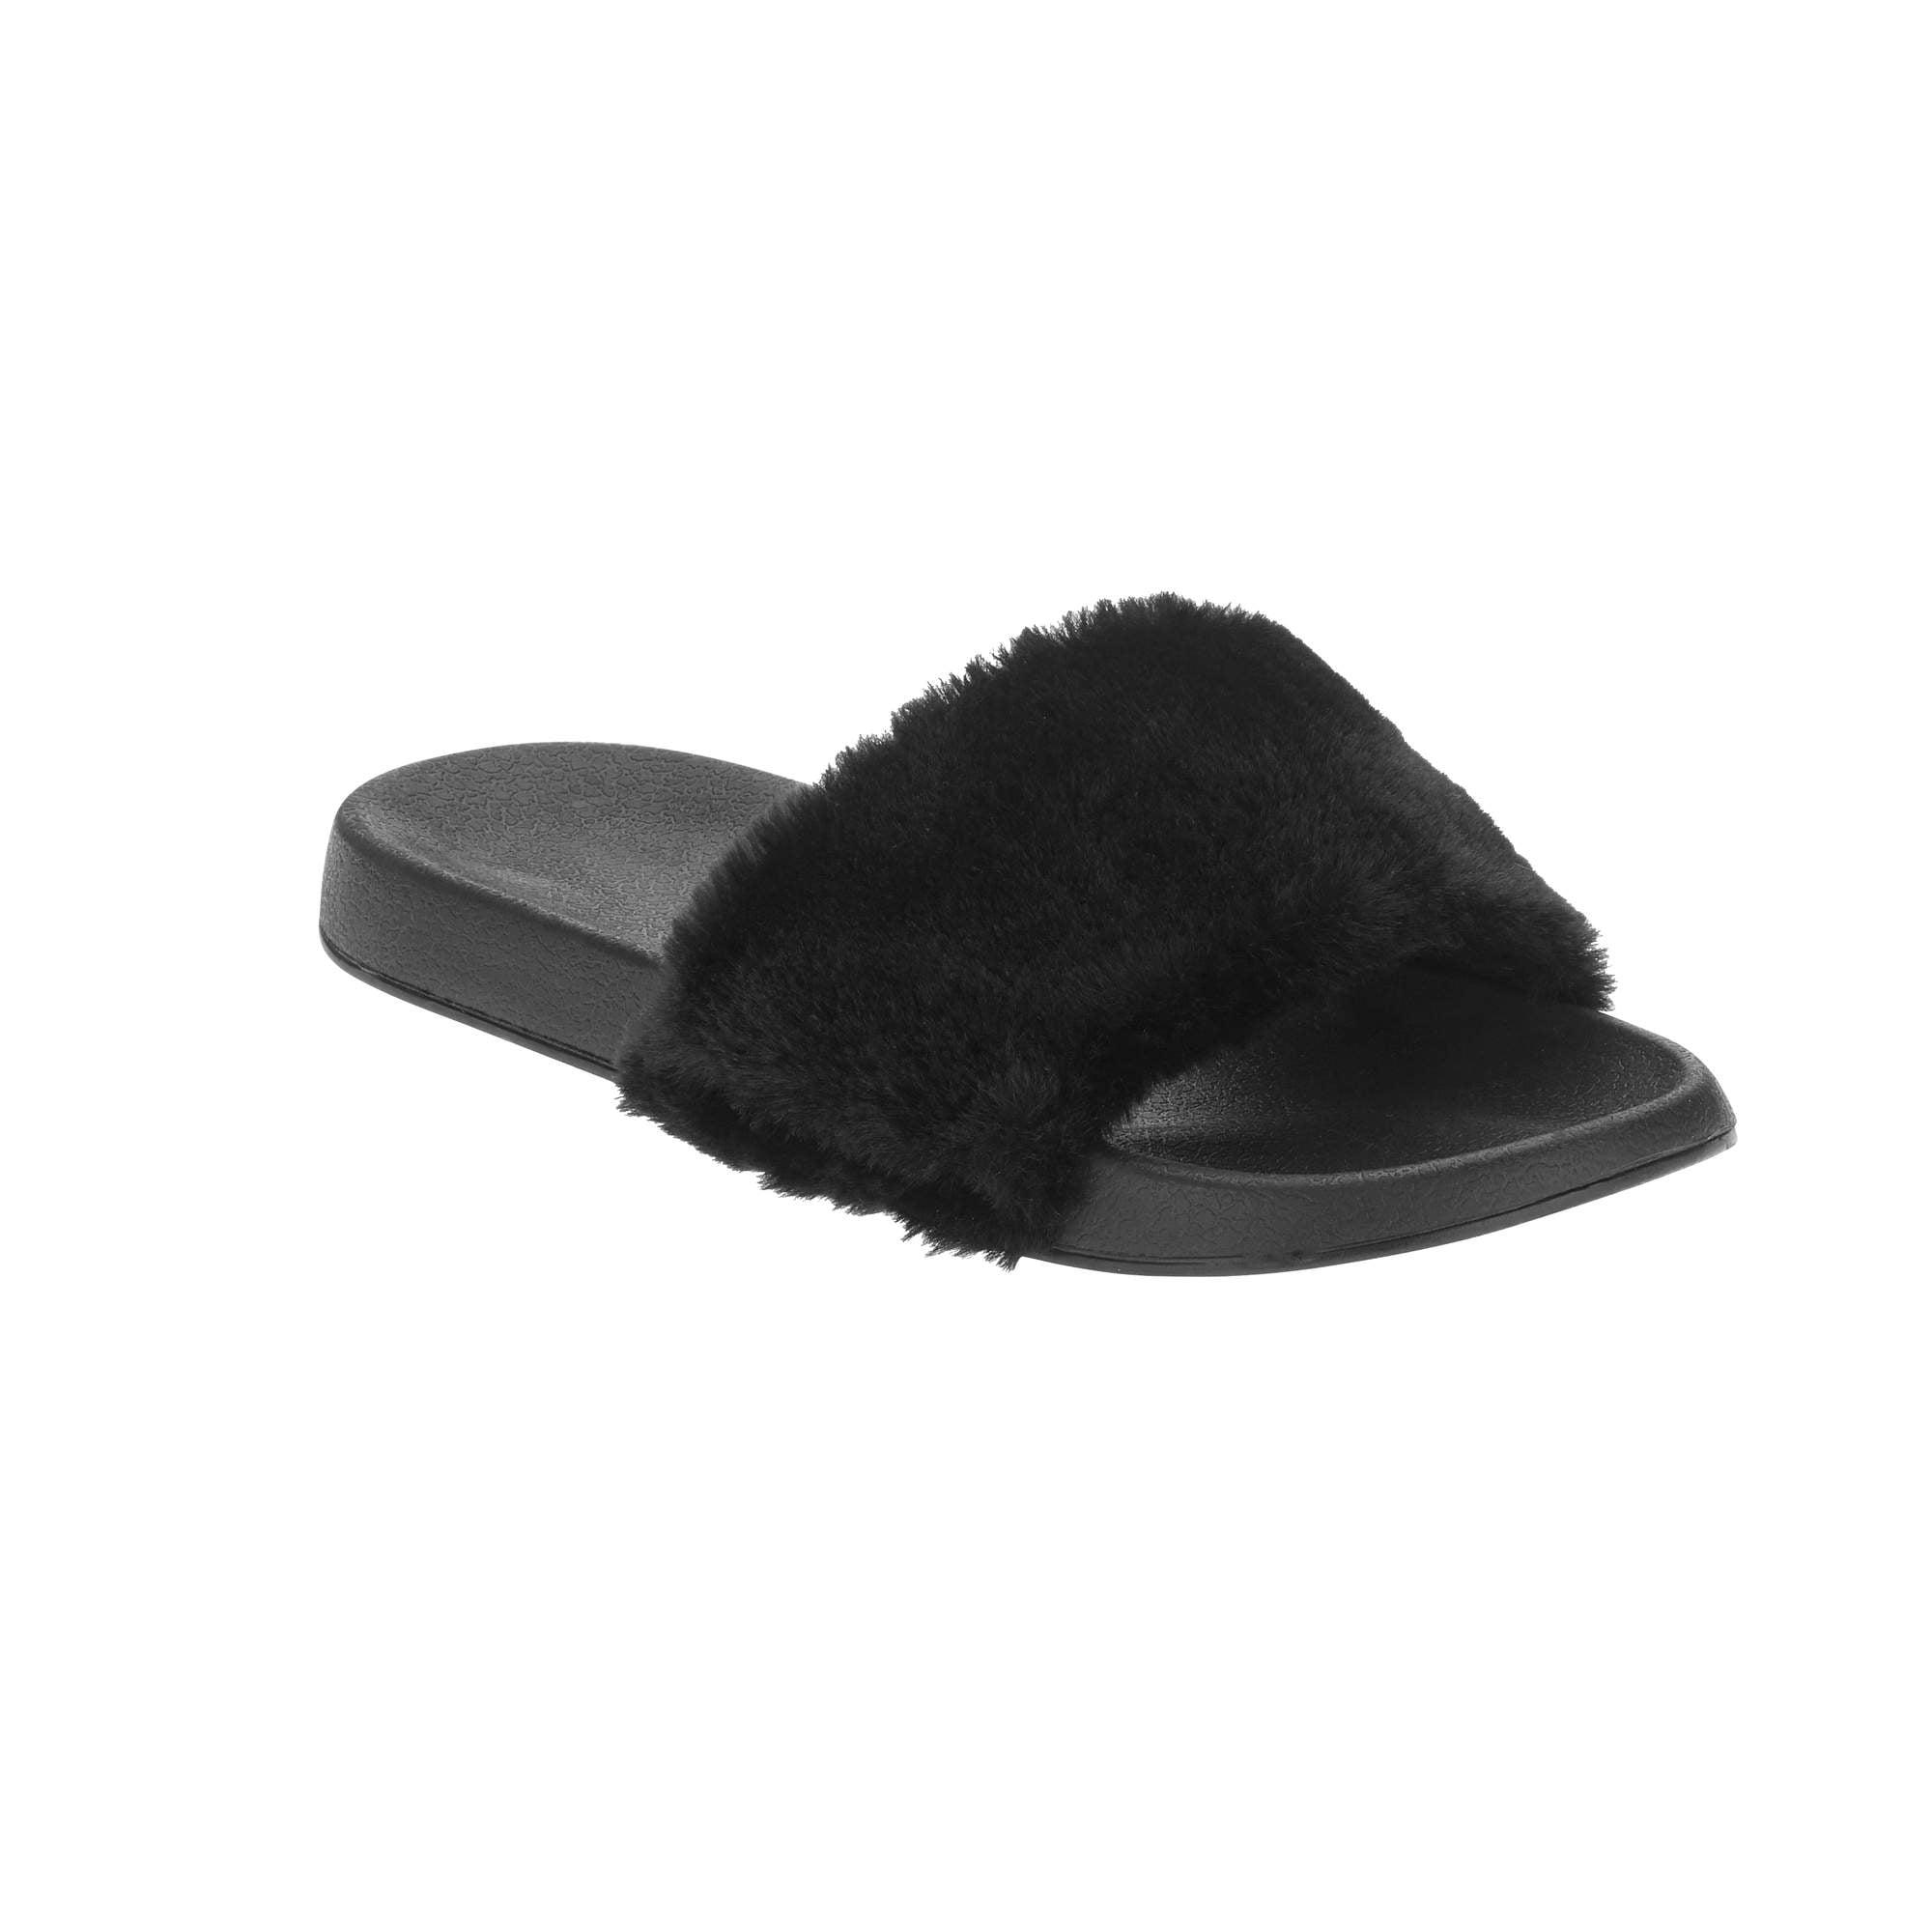 Women's Fur Slide - Walmart.com